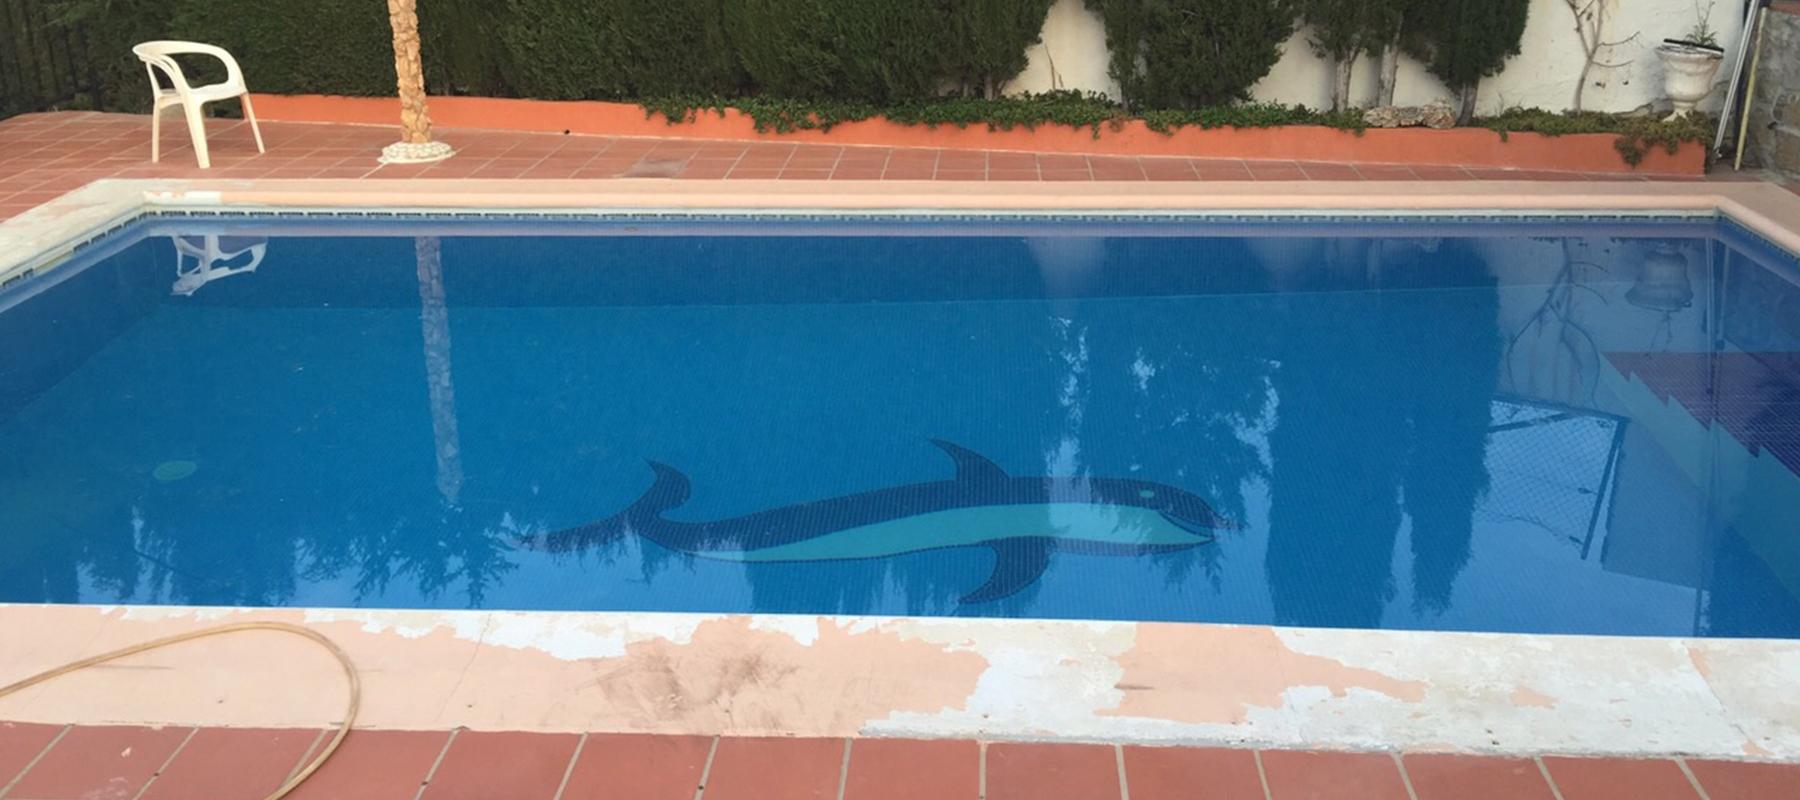 Reparaci n del vaso de piscinas granagua empresa for Vaso piscina